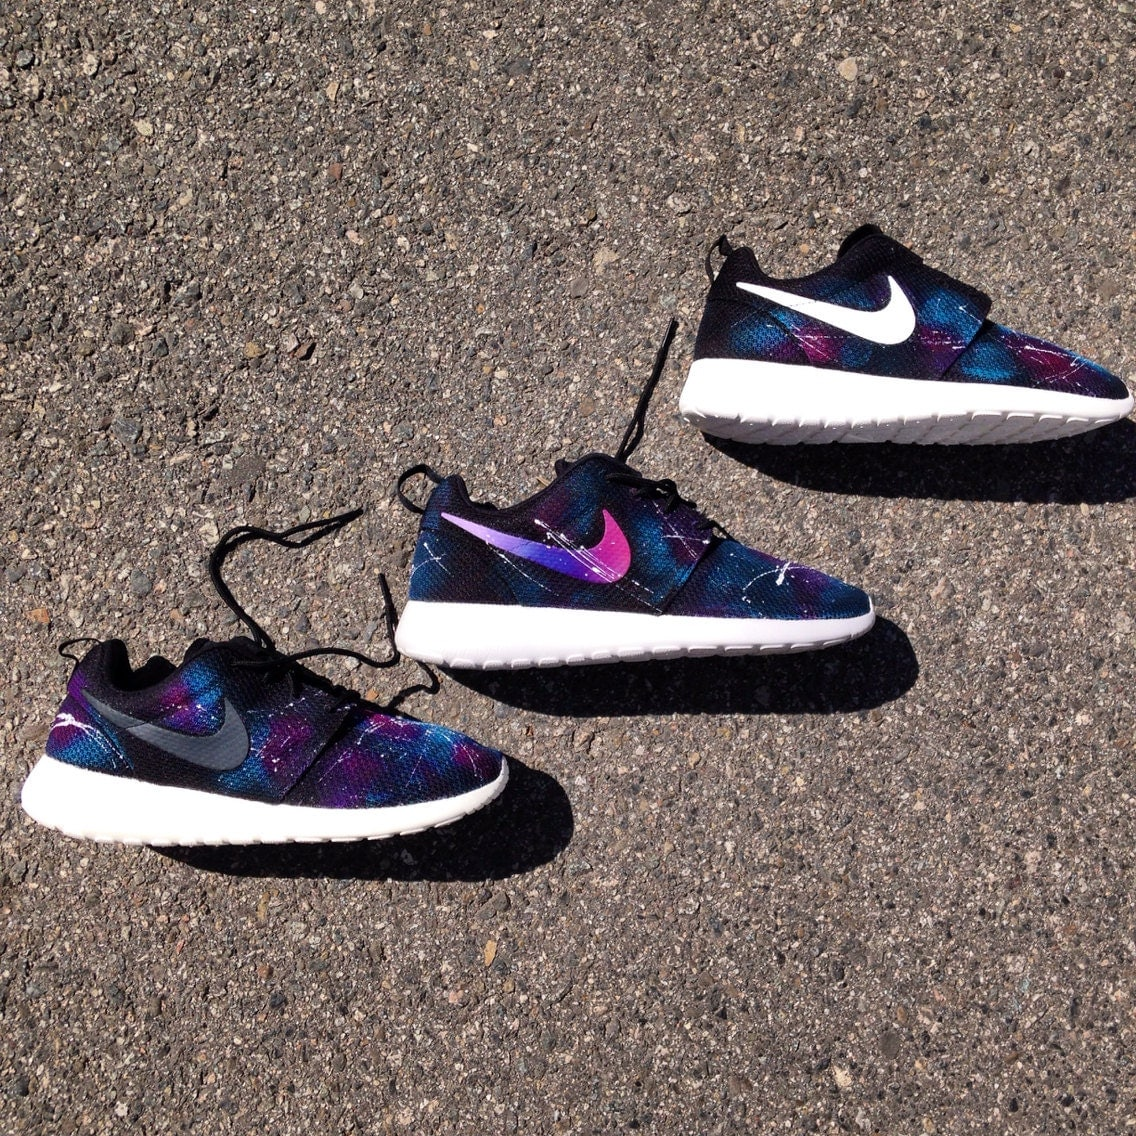 Nike roshe run galaxy women